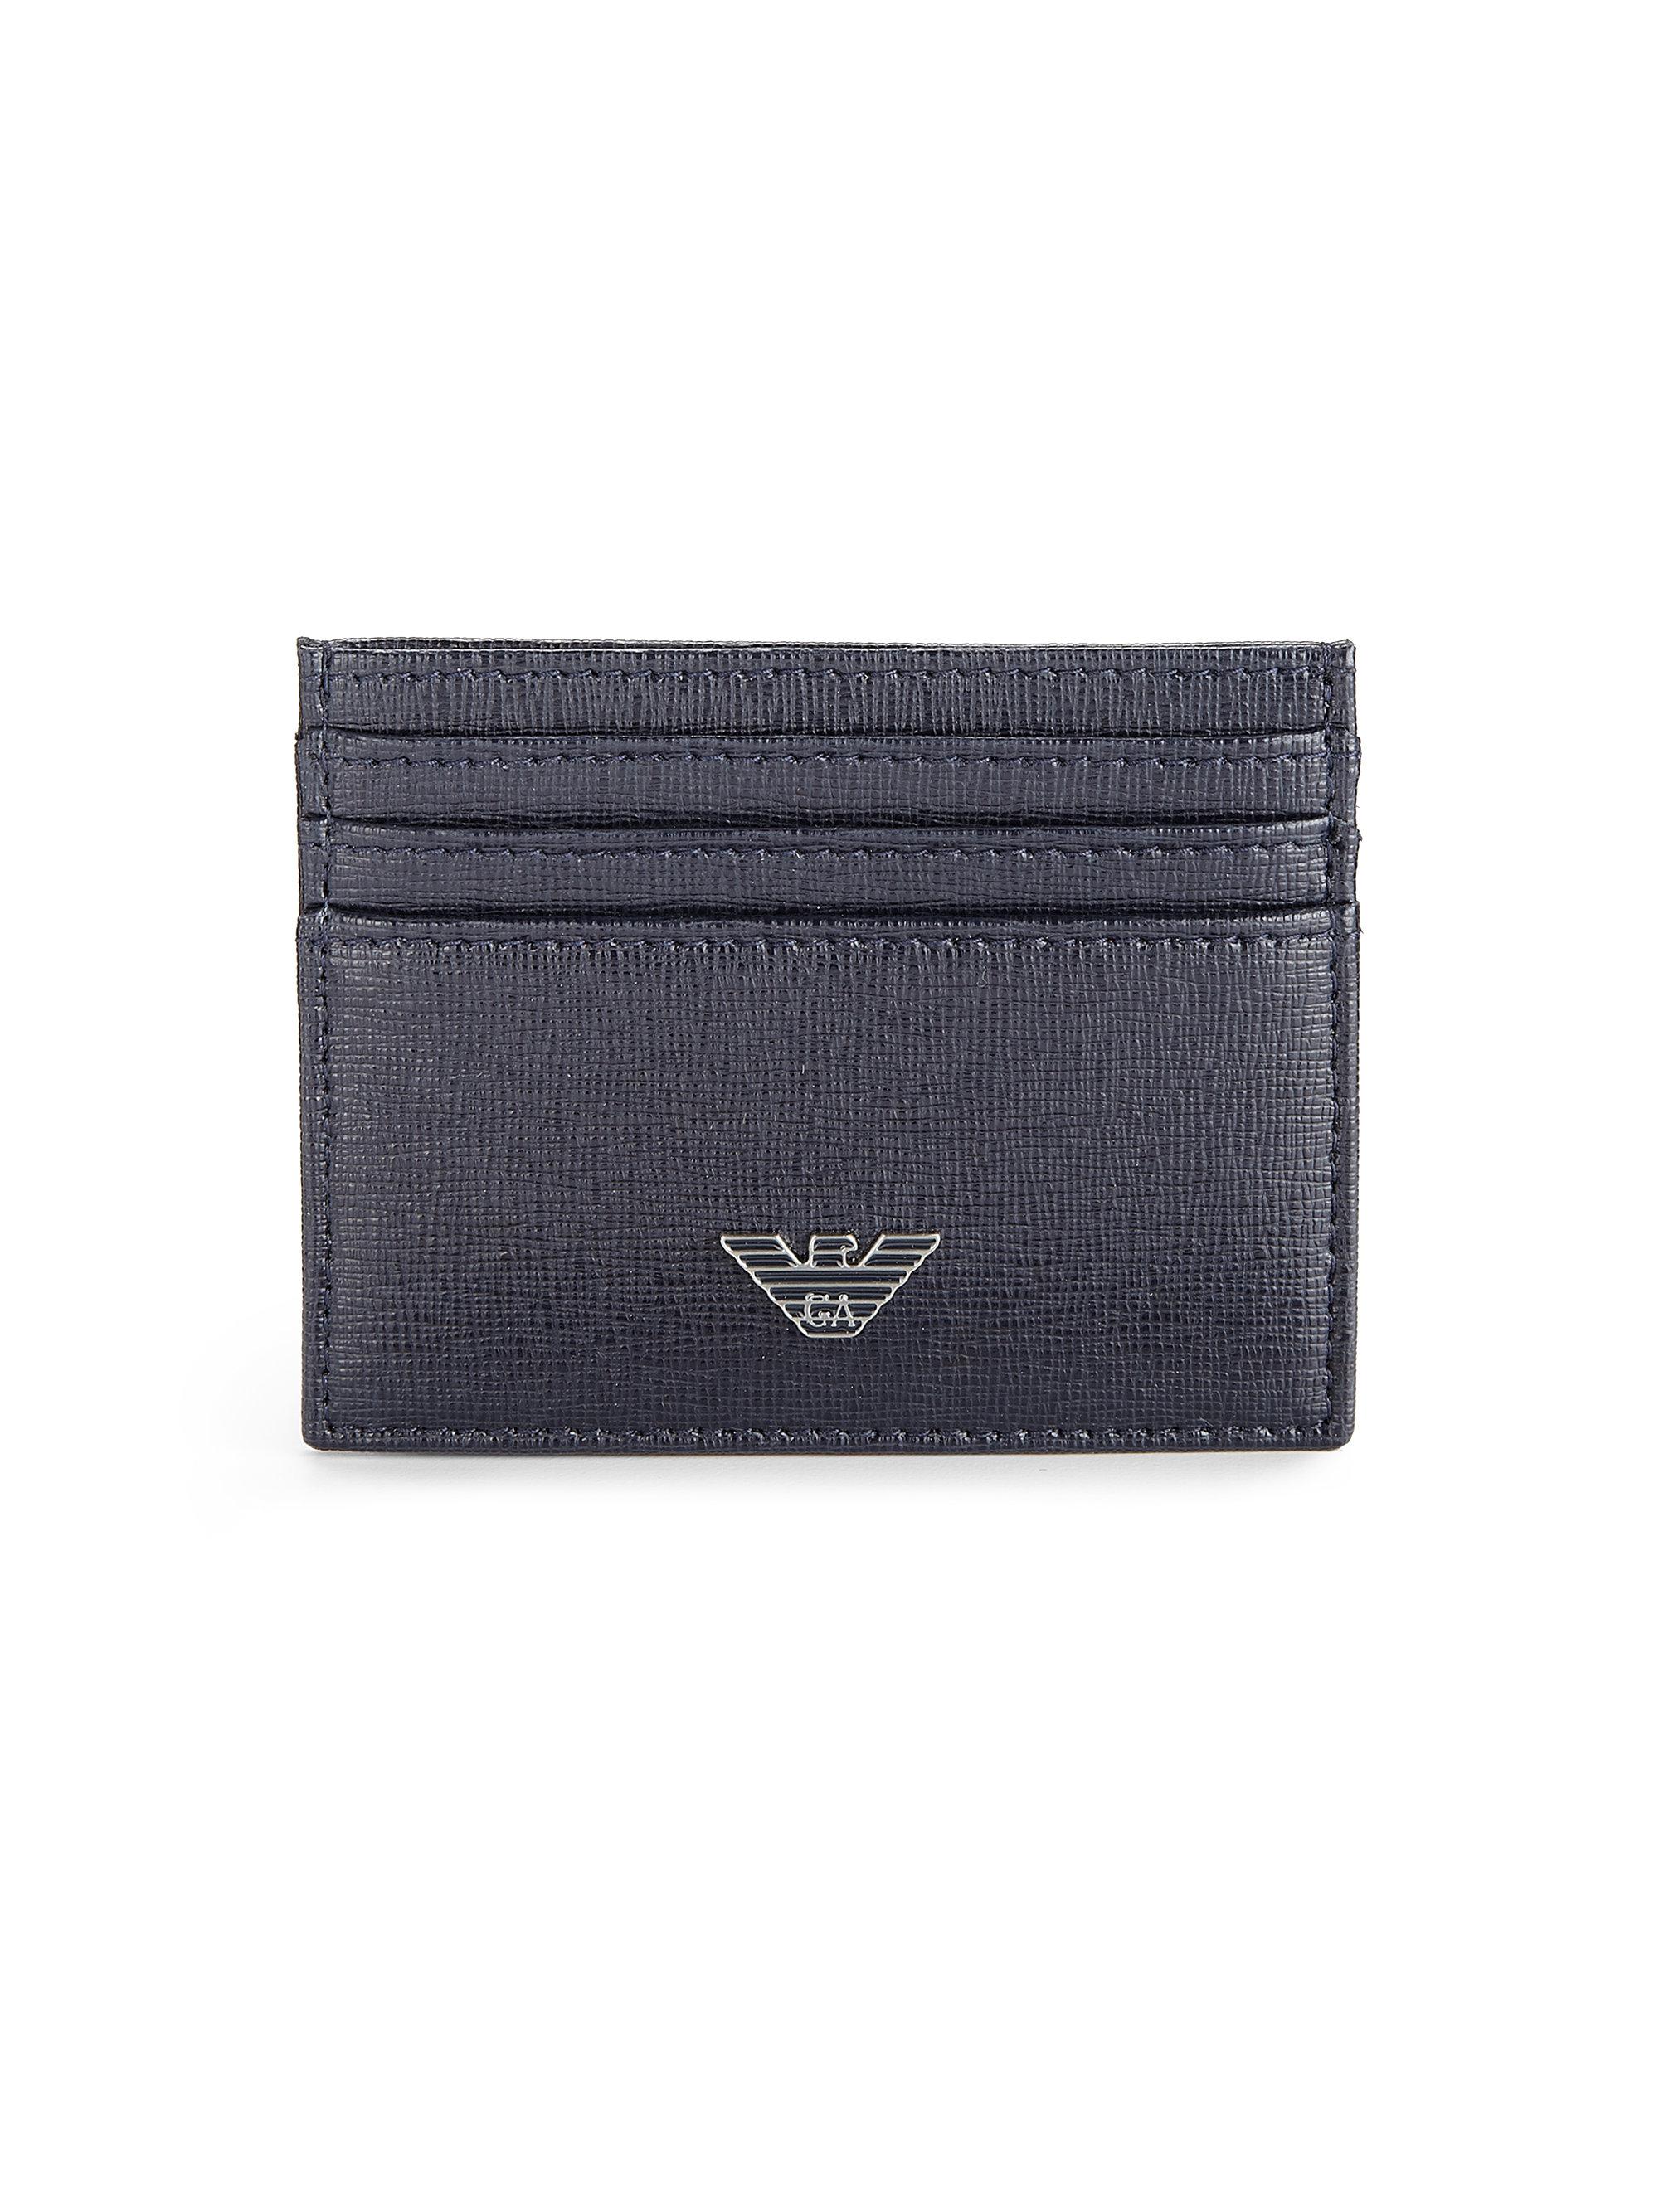 Lyst - Emporio Armani Leather Card Holder in Blue for Men e018af7181